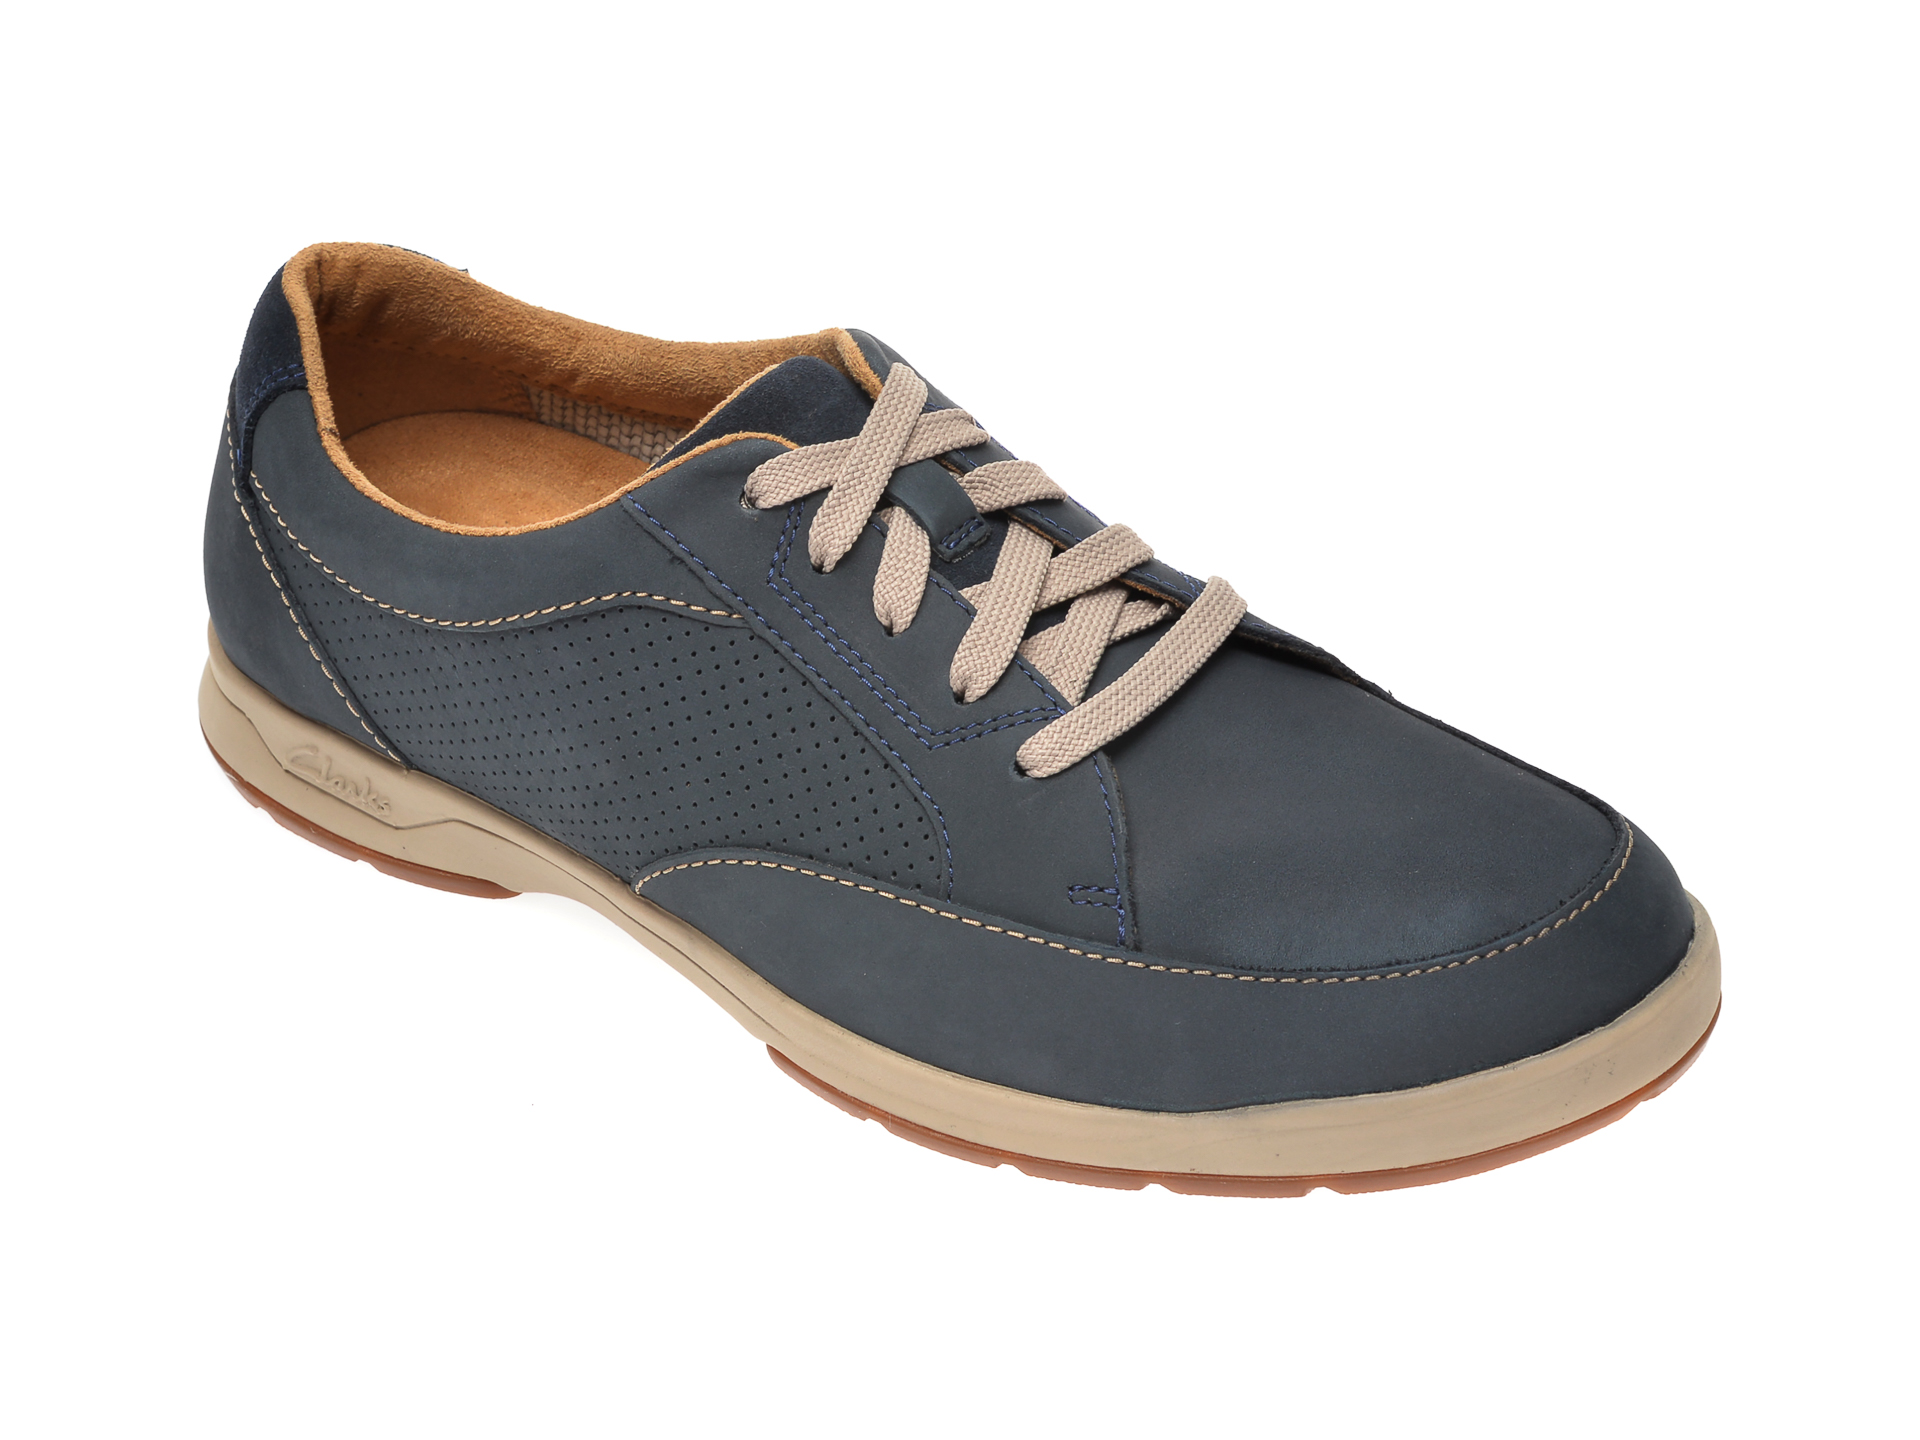 Pantofi CLARKS bleumarin, Stafford Park5, din nabuc imagine